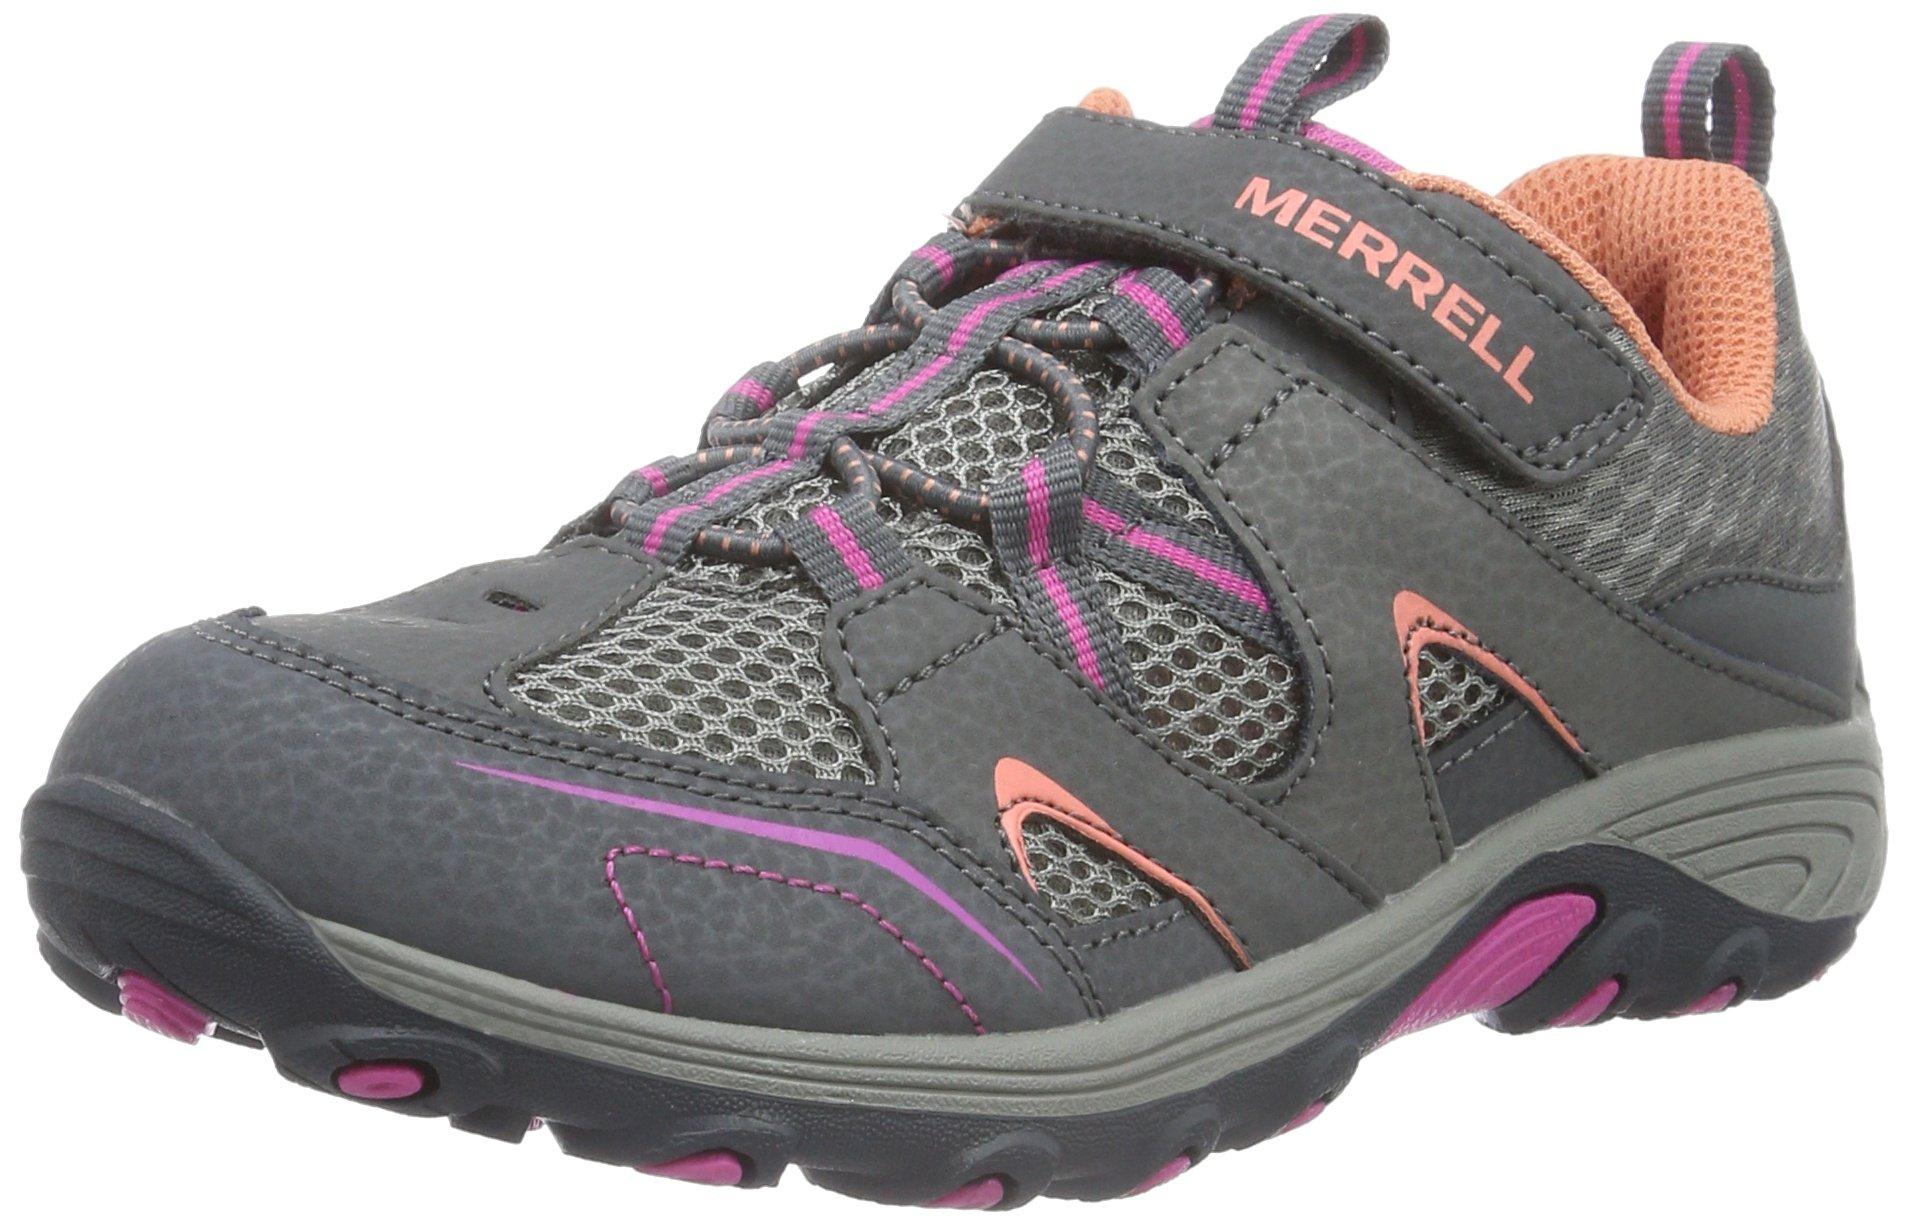 Merrell Trail Chaser Hiking Shoe (Little Kid/Big Kid), Multi, 7 M US Big Kid by Merrell